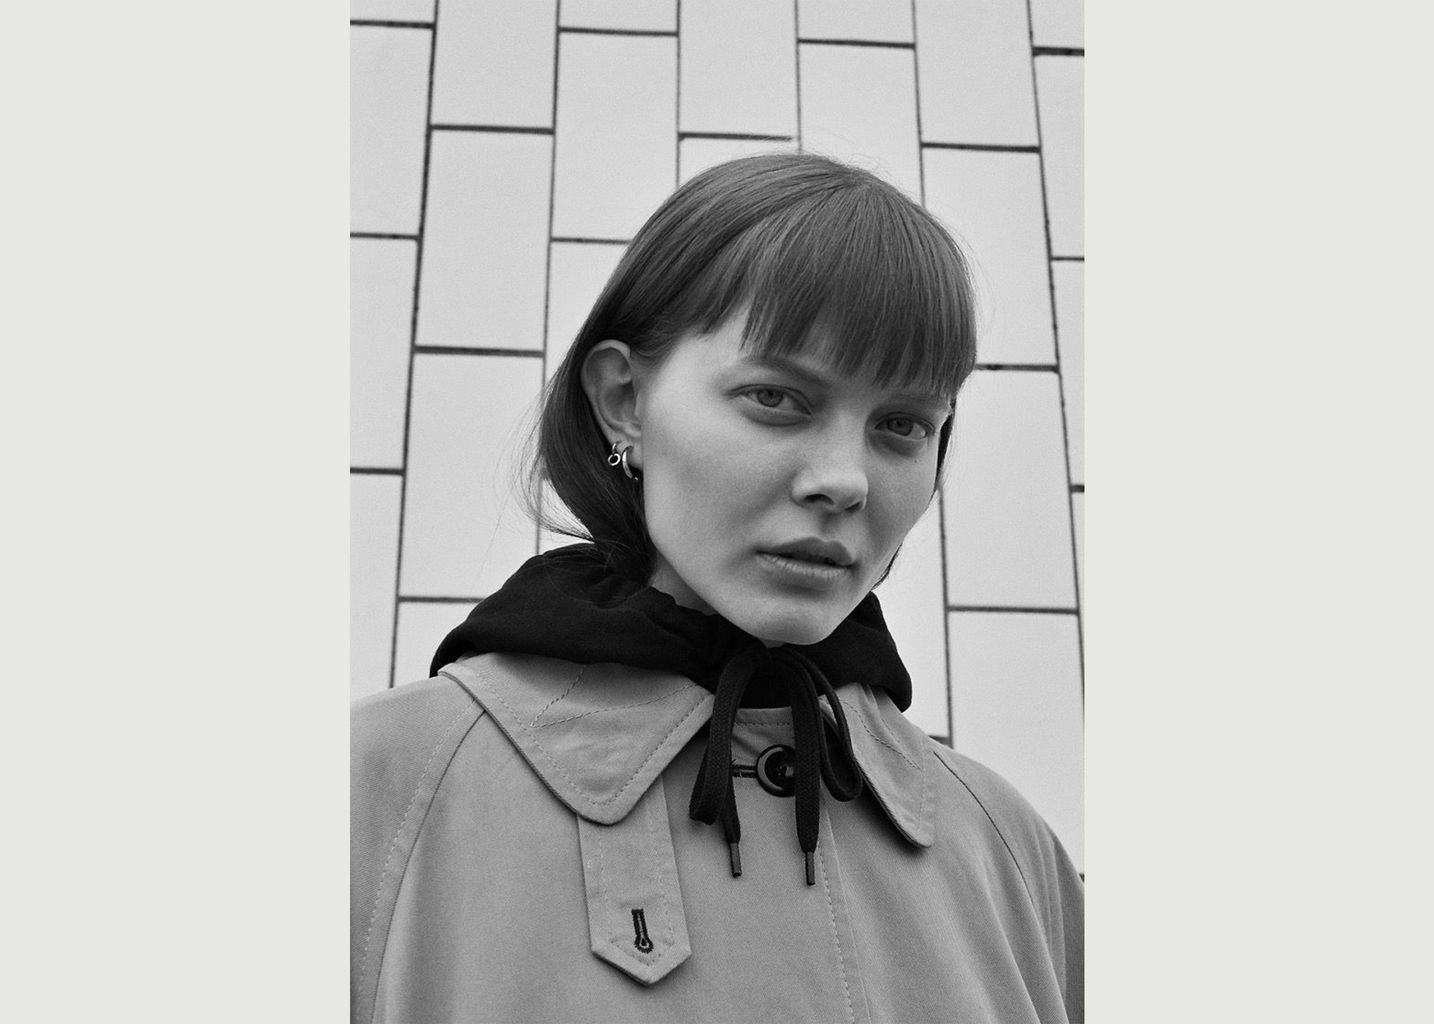 Boucle d'Oreille Broken 18 - Maria Black